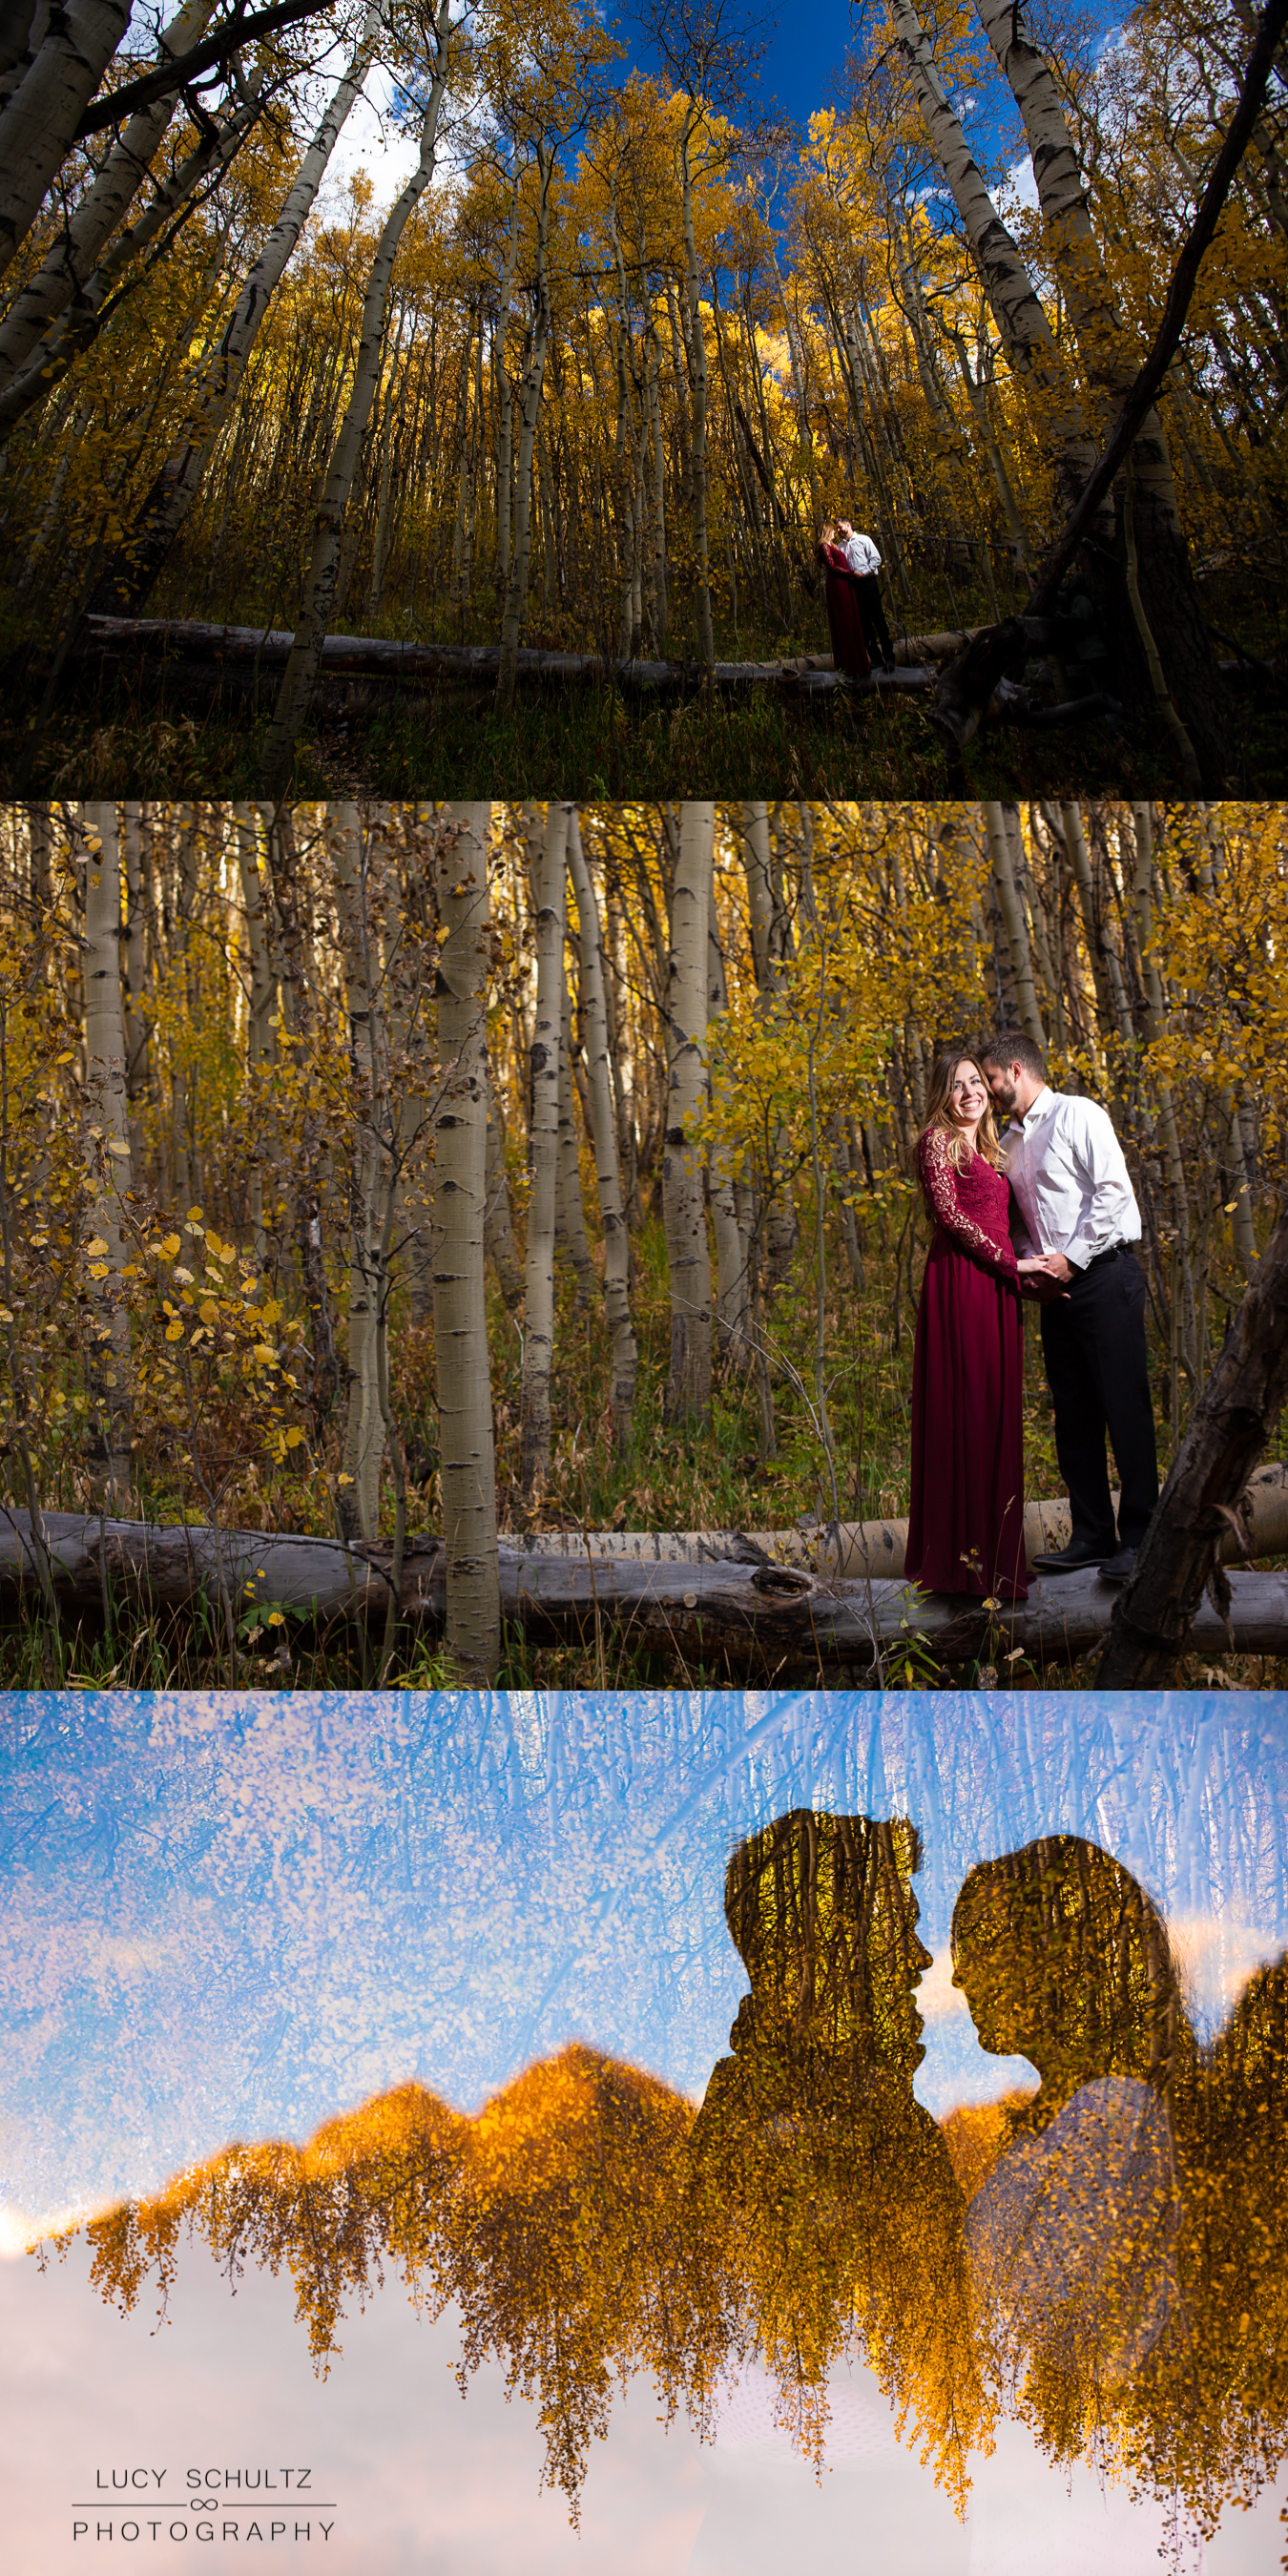 09AspenForestMaroonBellsFallEngagementSessionPhotographer